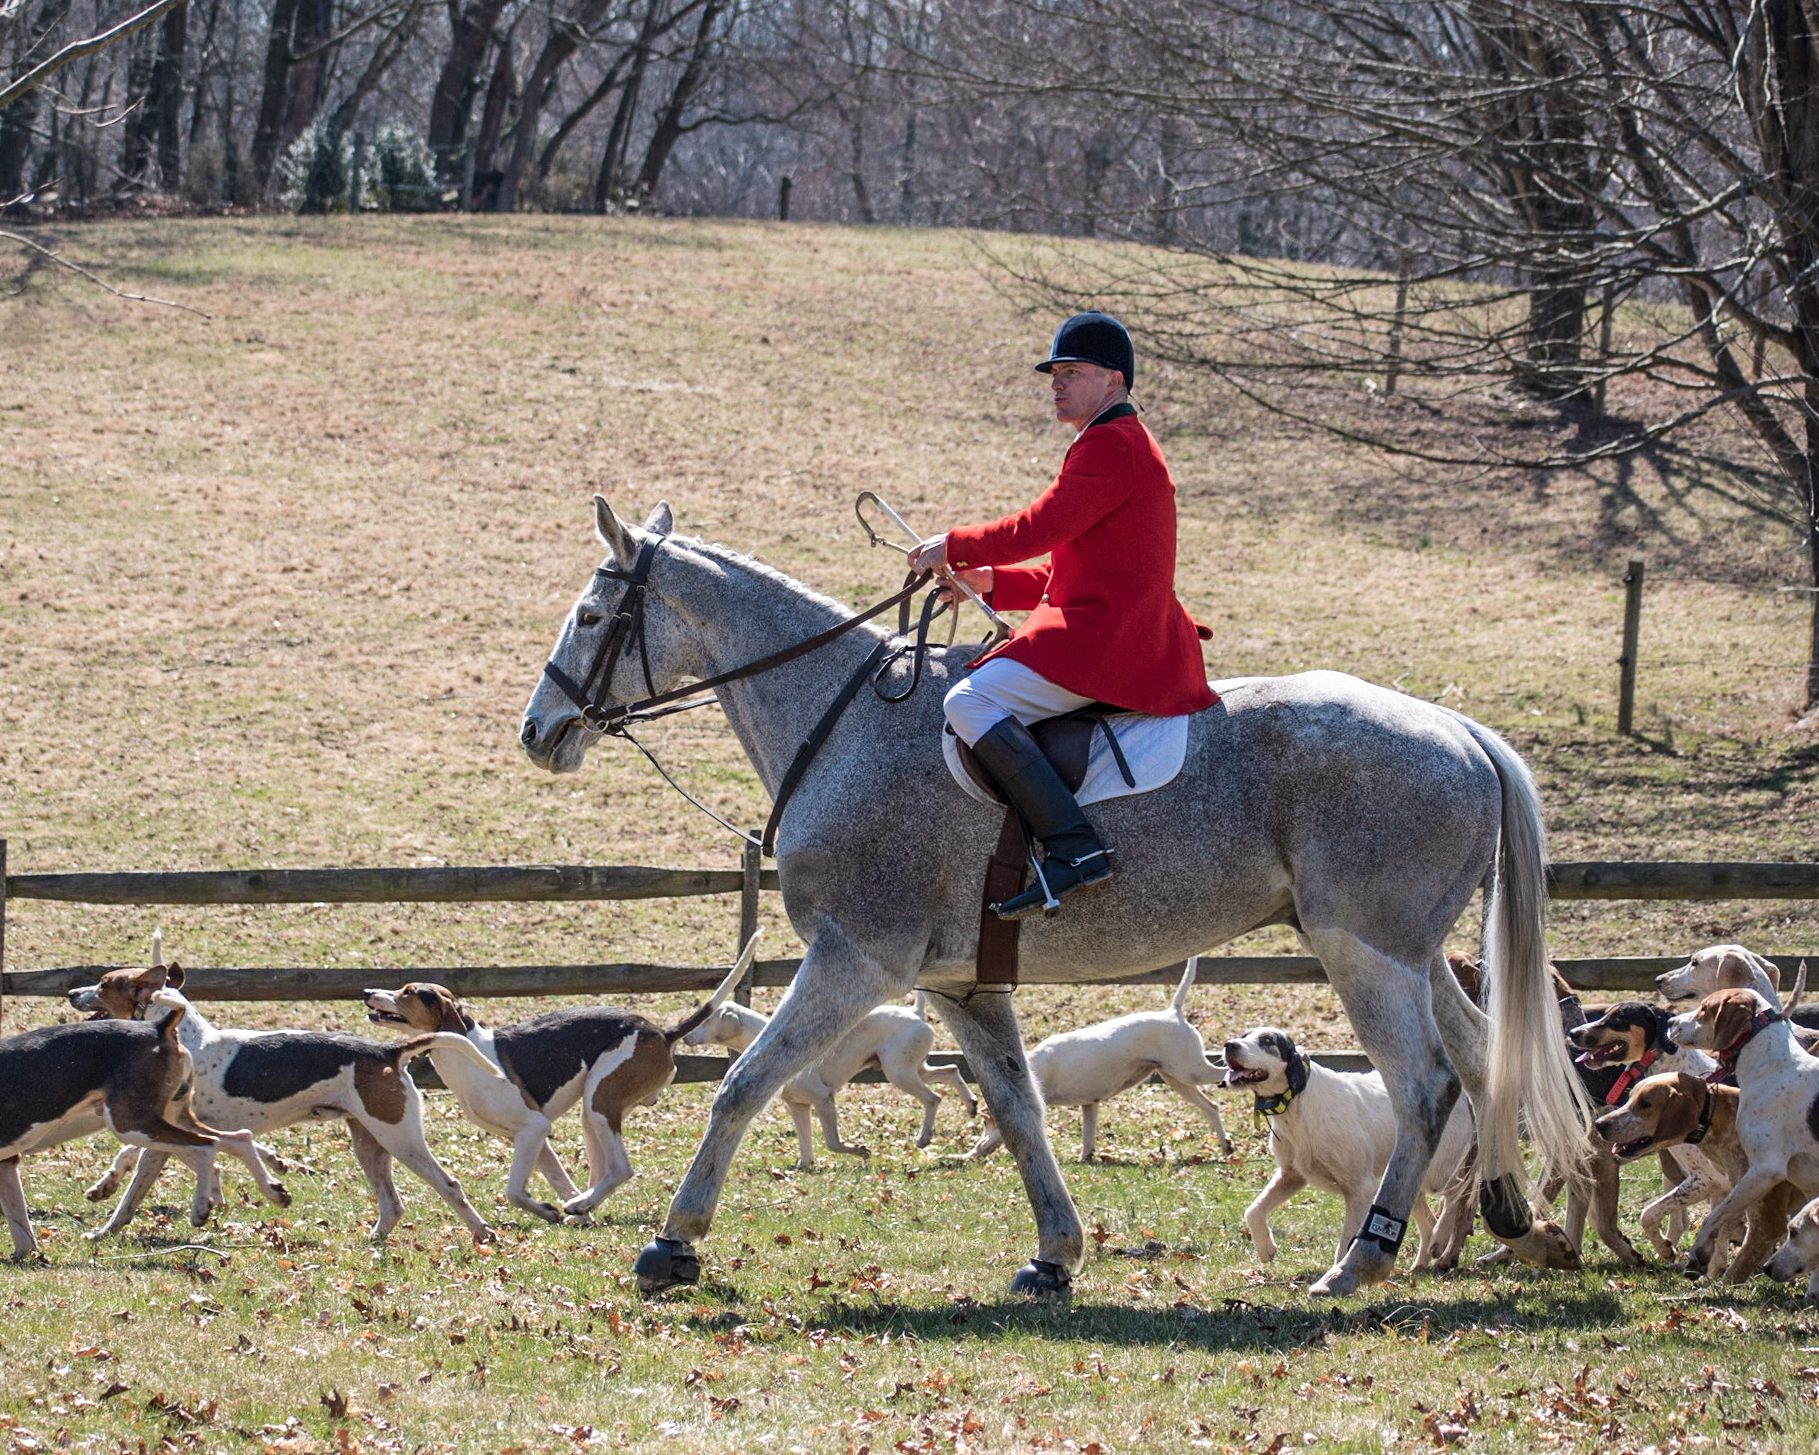 huntsman-ashley-hubbard-green-spring-valley-hounds-foxhunting.jpg